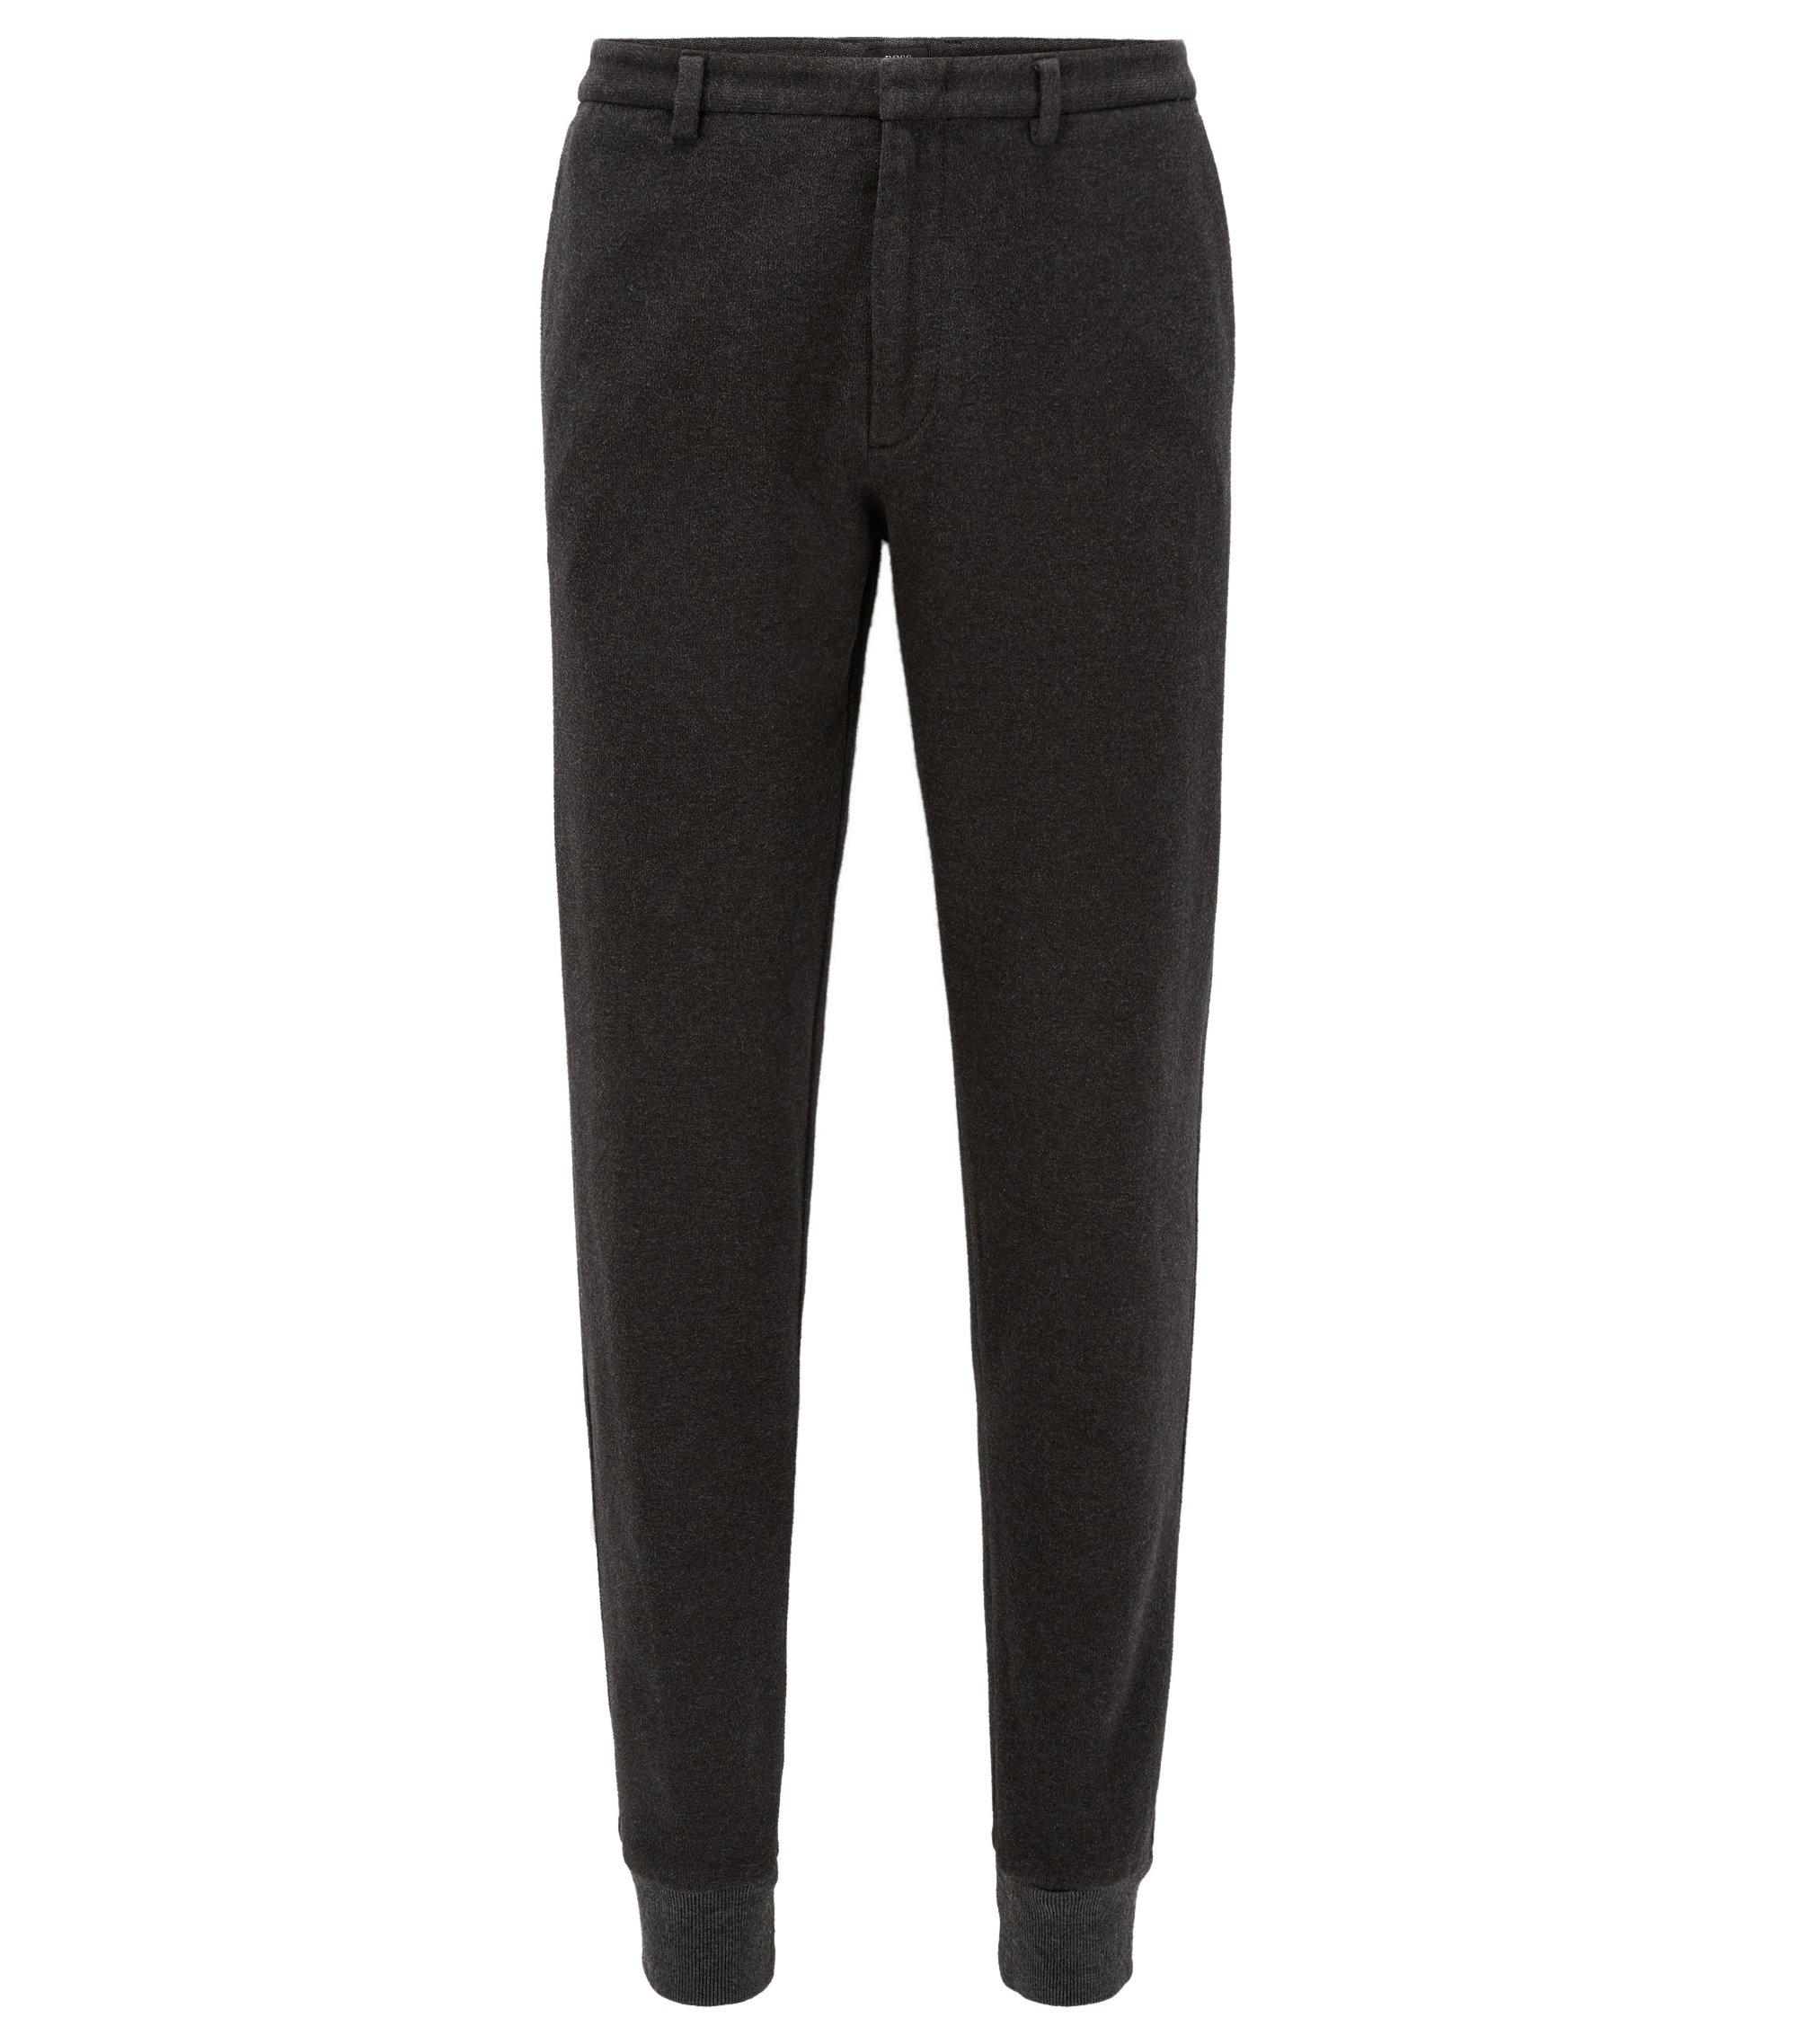 Slim-fit cuffed trousers in brushed cotton, Dark Grey